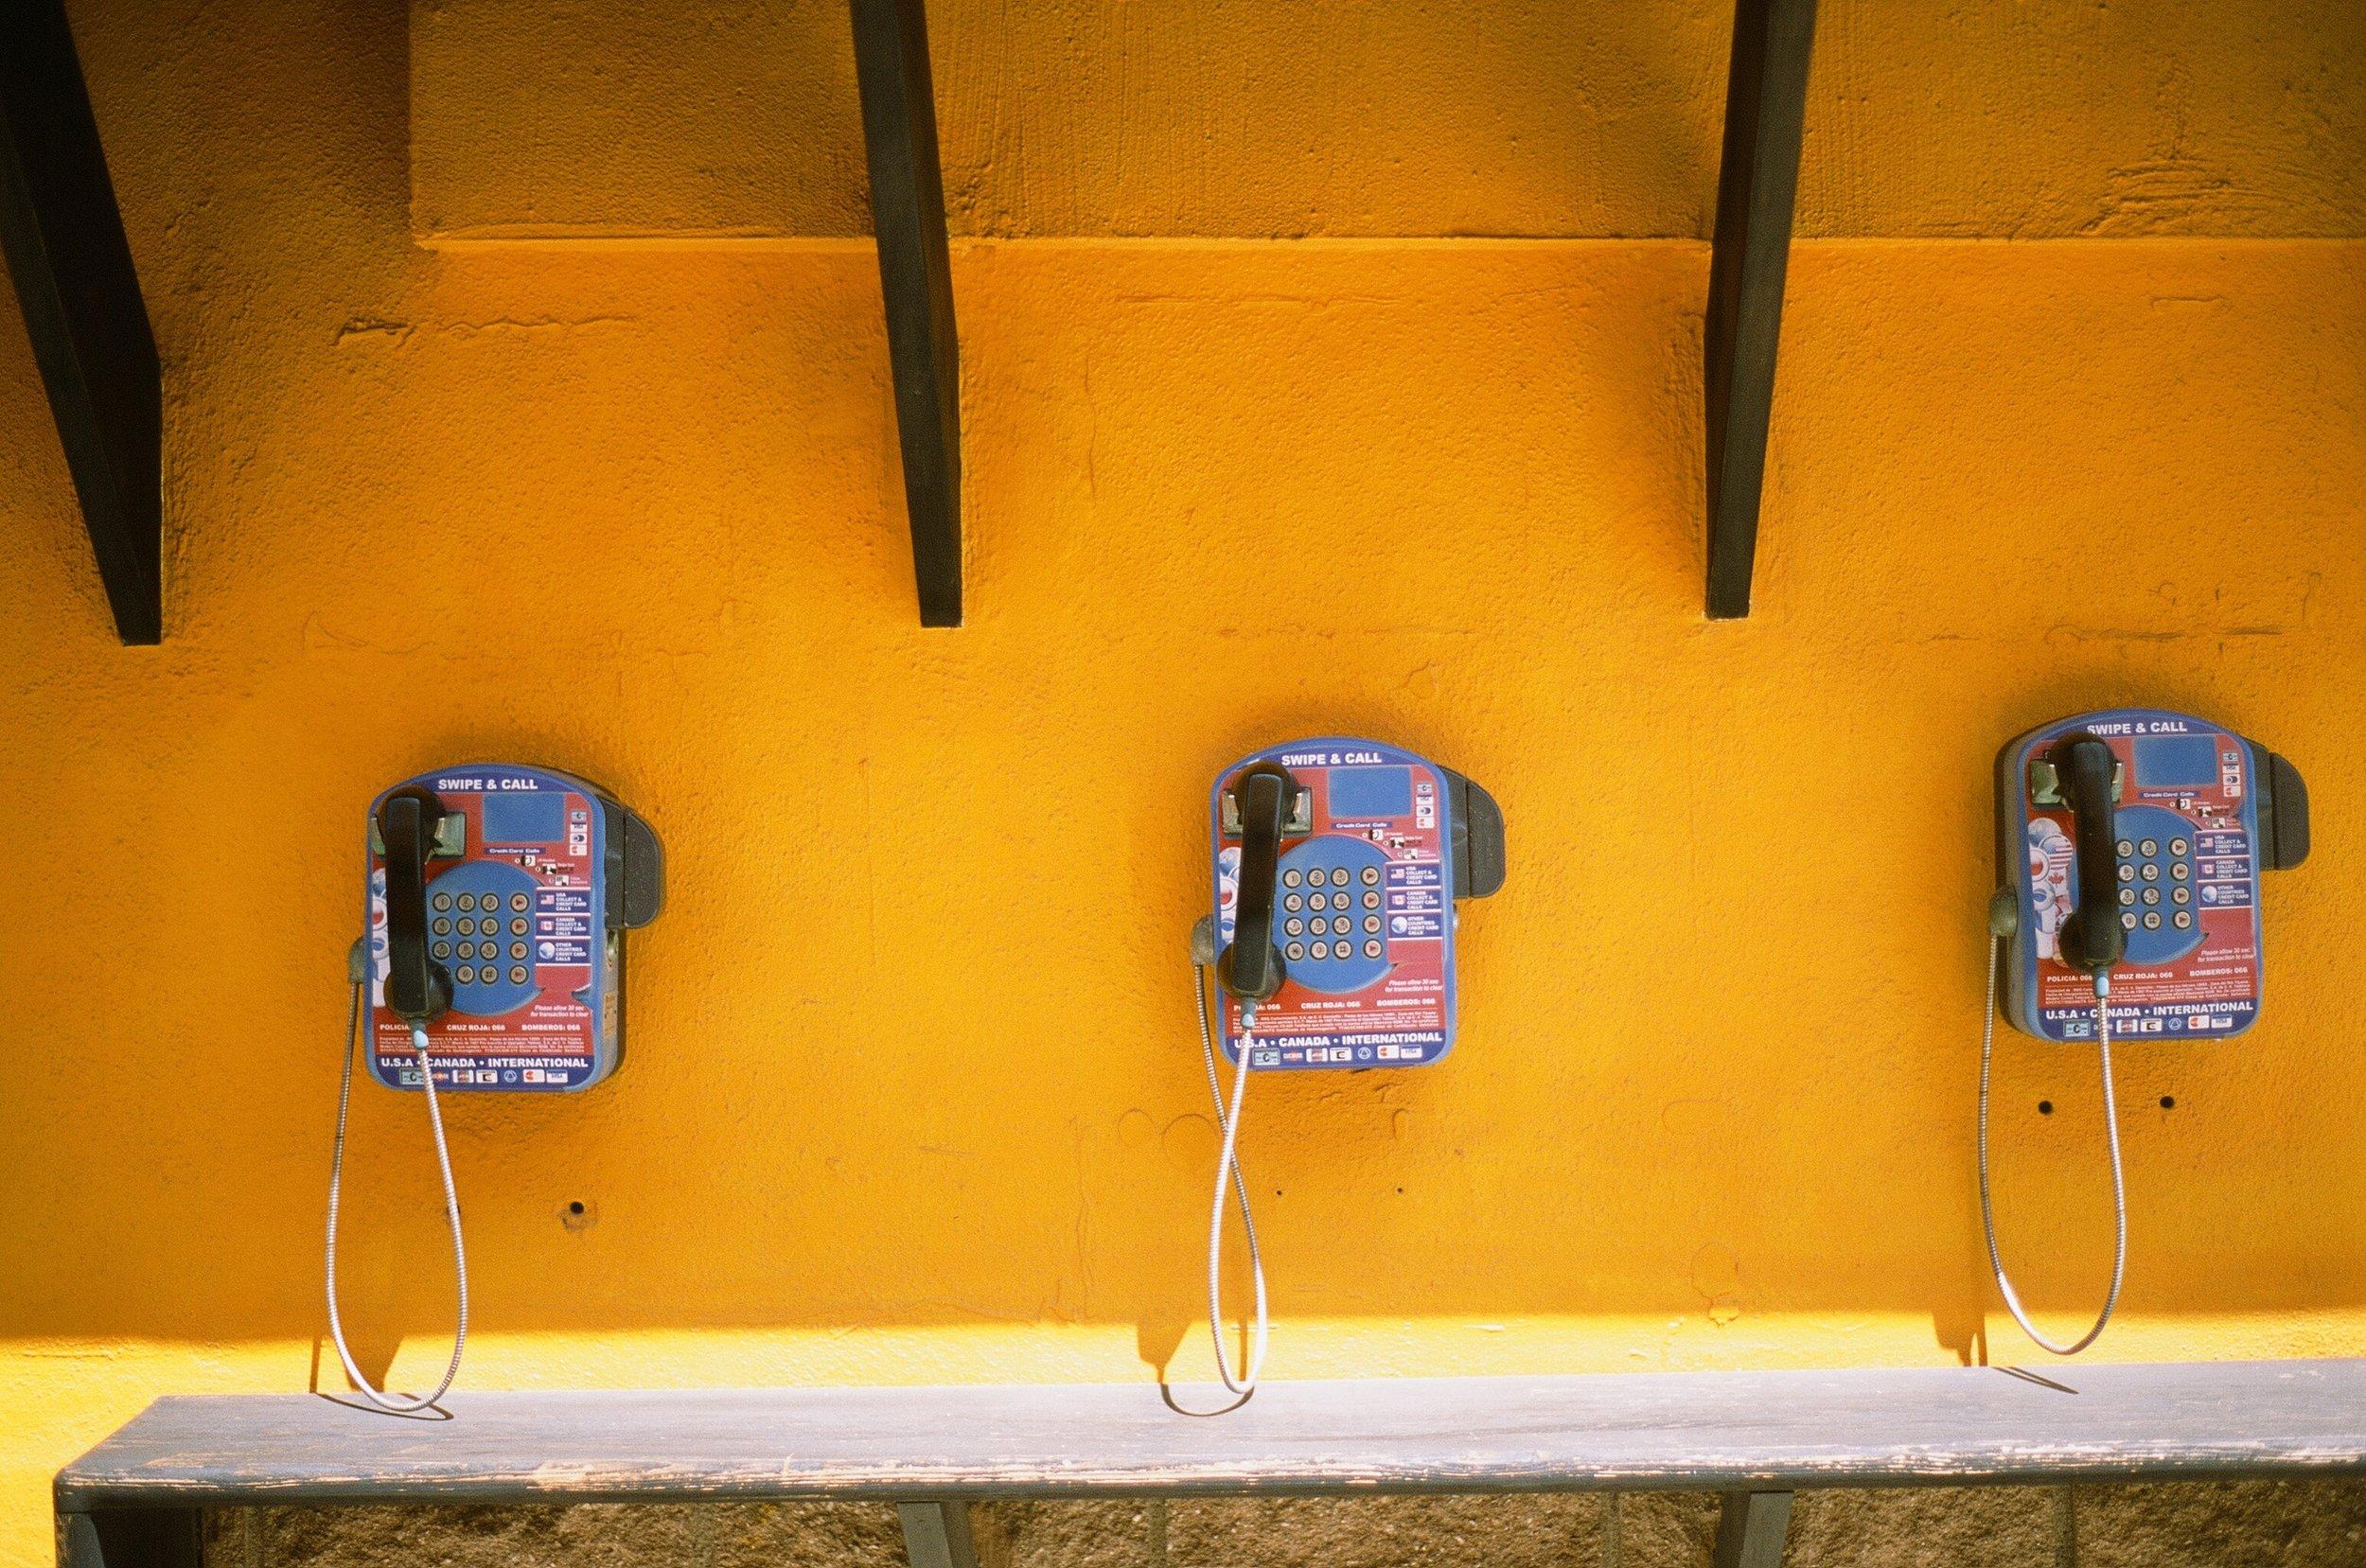 call-box-phone-box-phones-2693.jpg